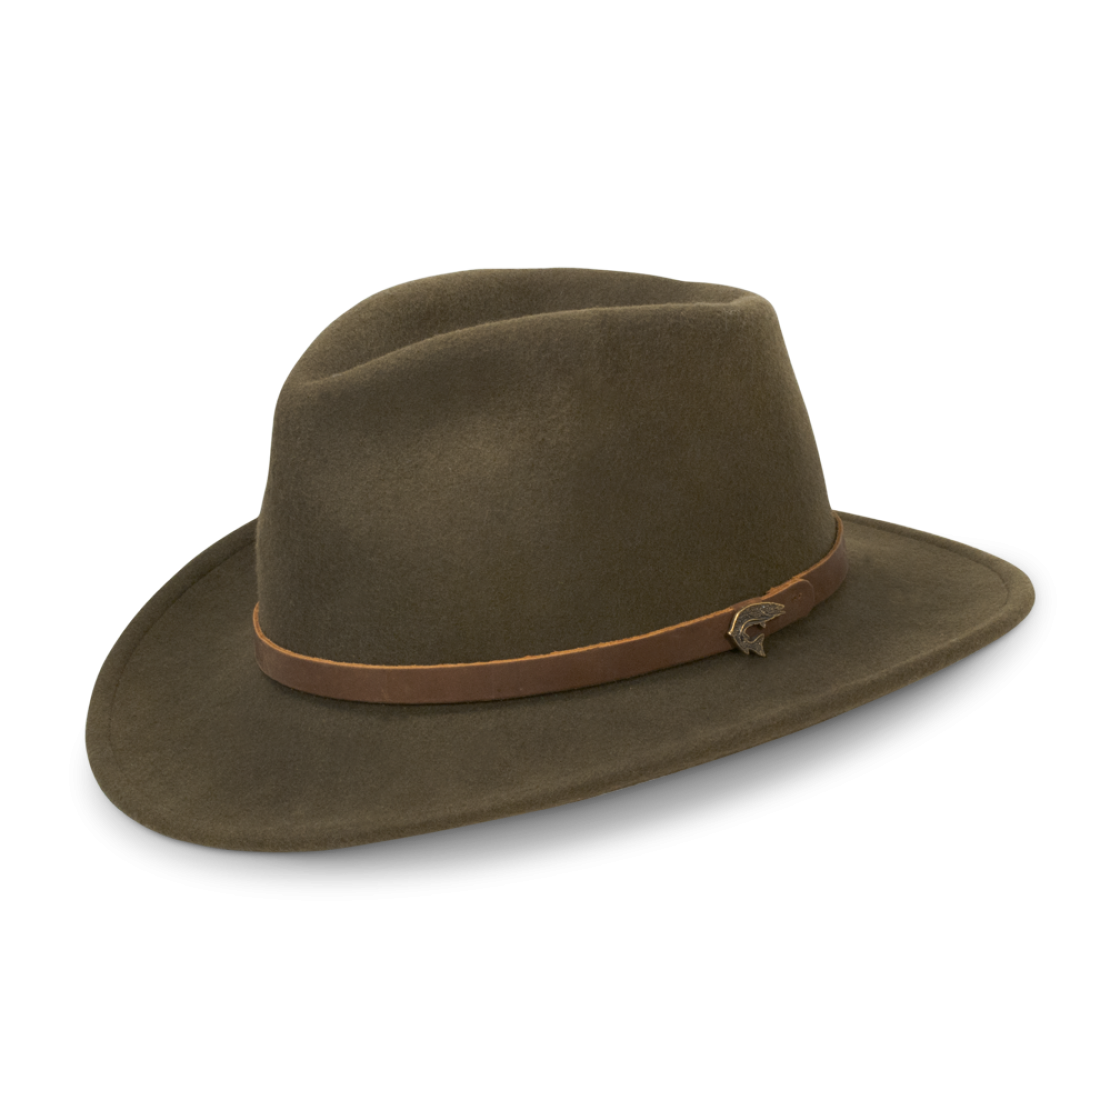 Henry Jones Felt Fedora Hat Goorin Bros Hat Shop Mens Hats Fashion Hats For Men Mens Accessories Fashion